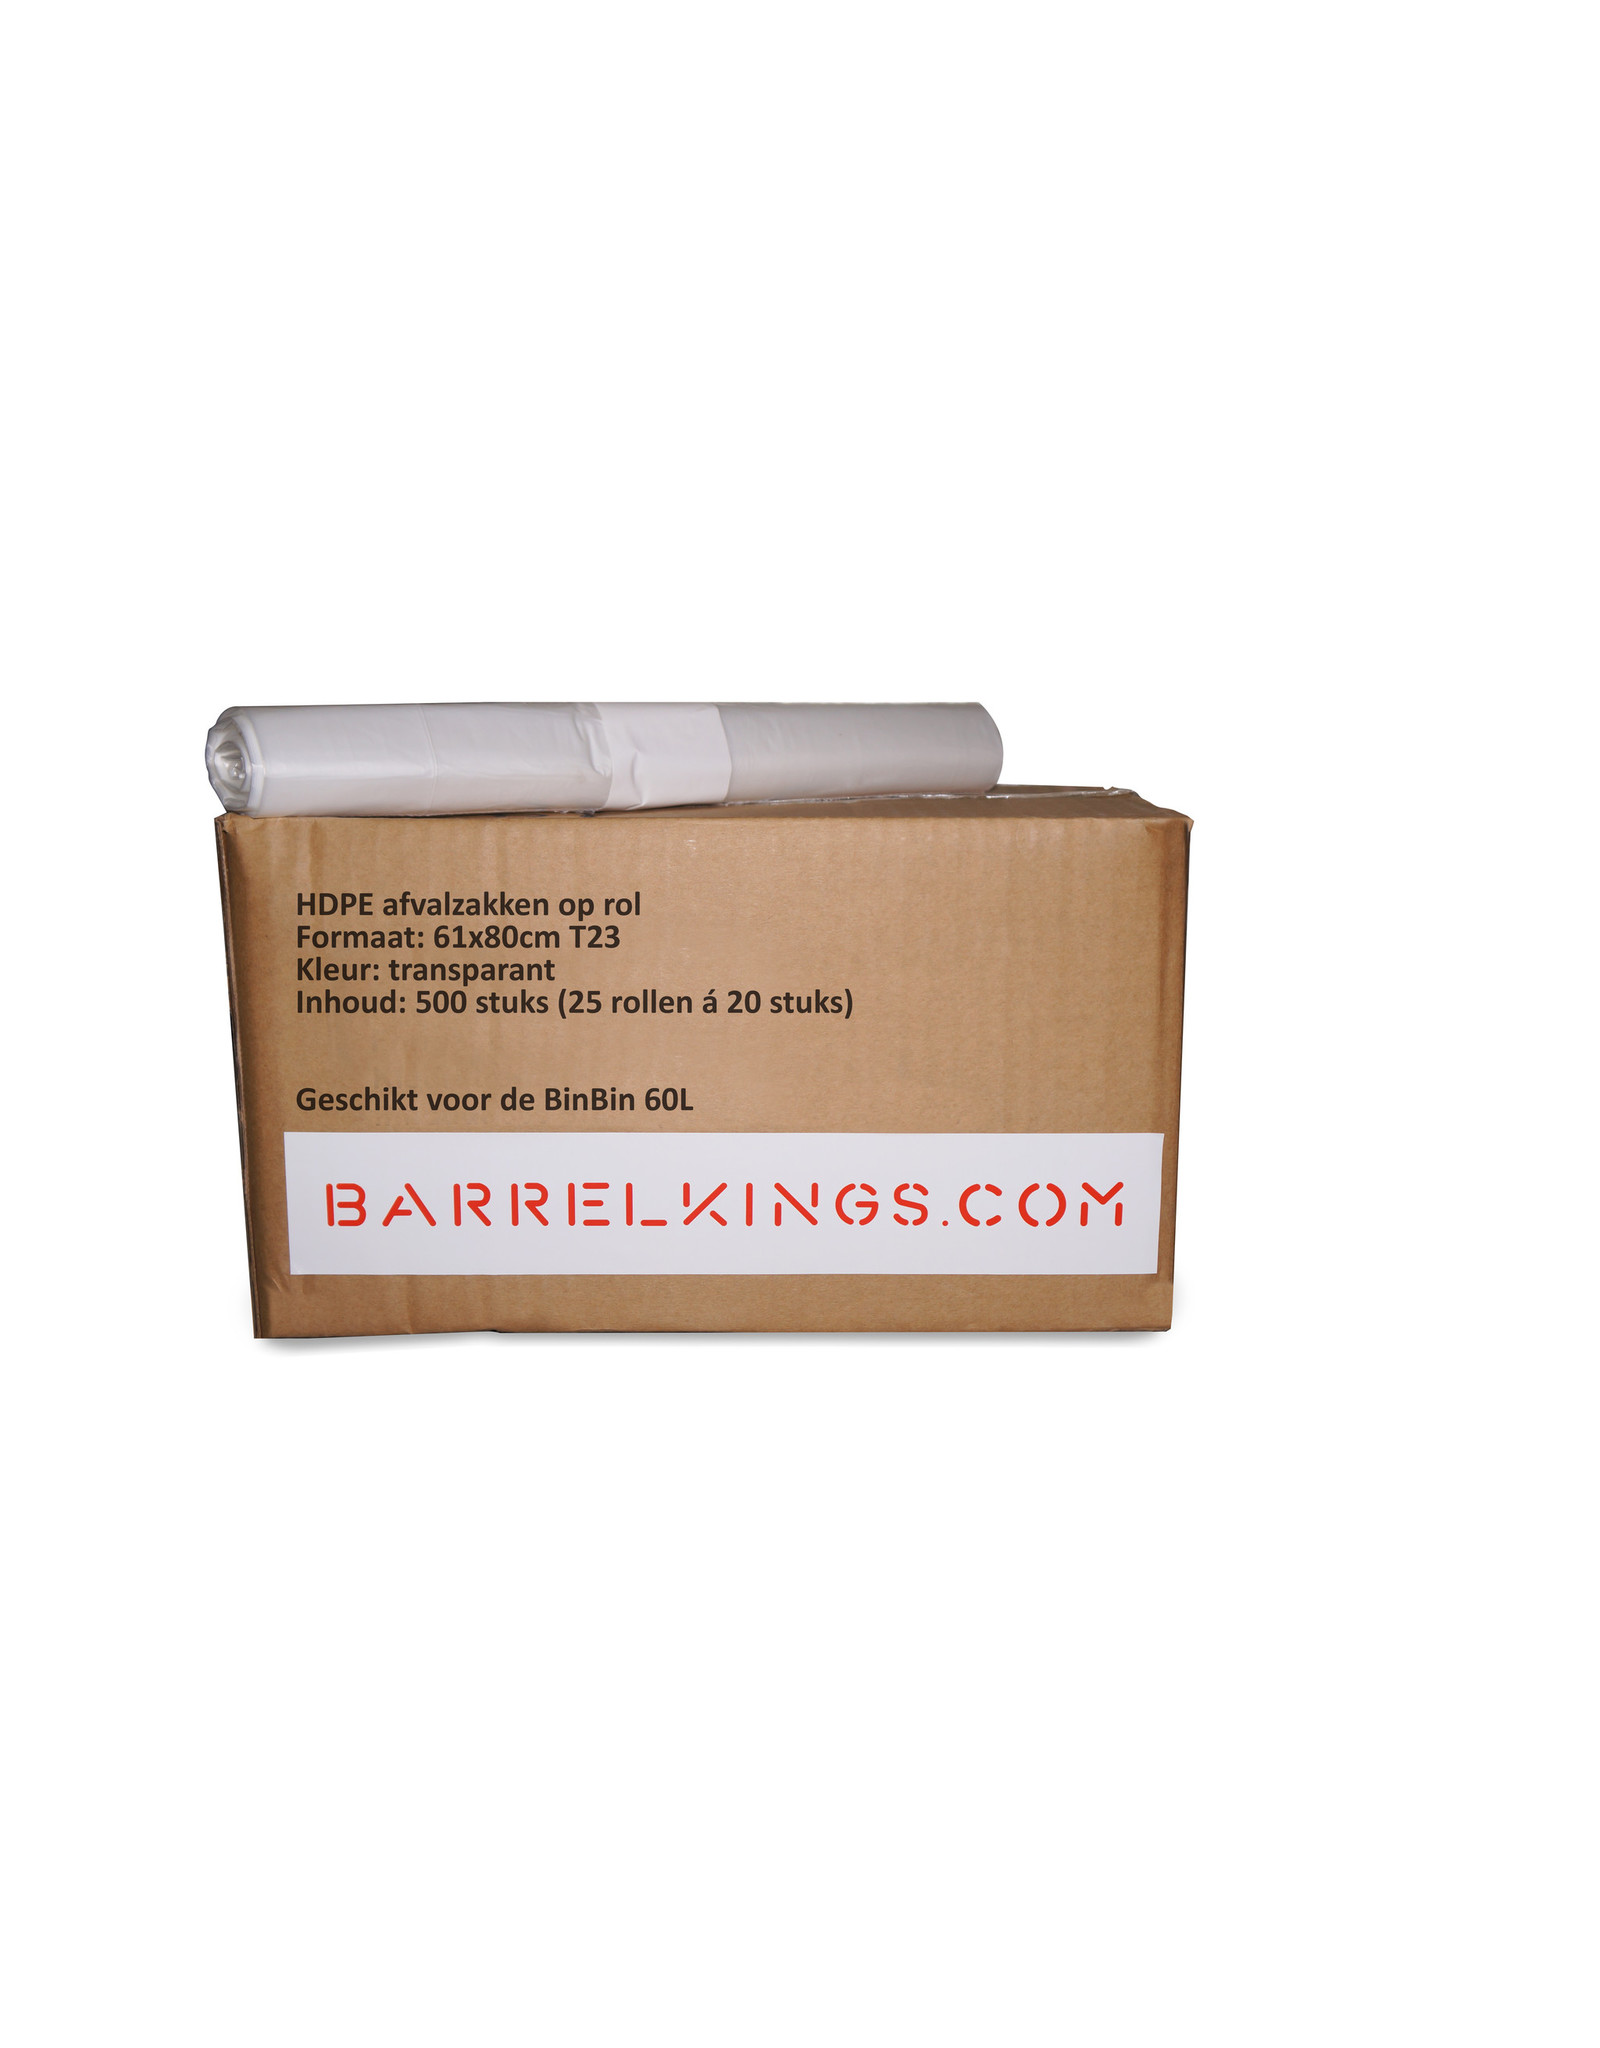 BinBin BinBin Hole industriële prullenbak 60 Liter olievat zwart